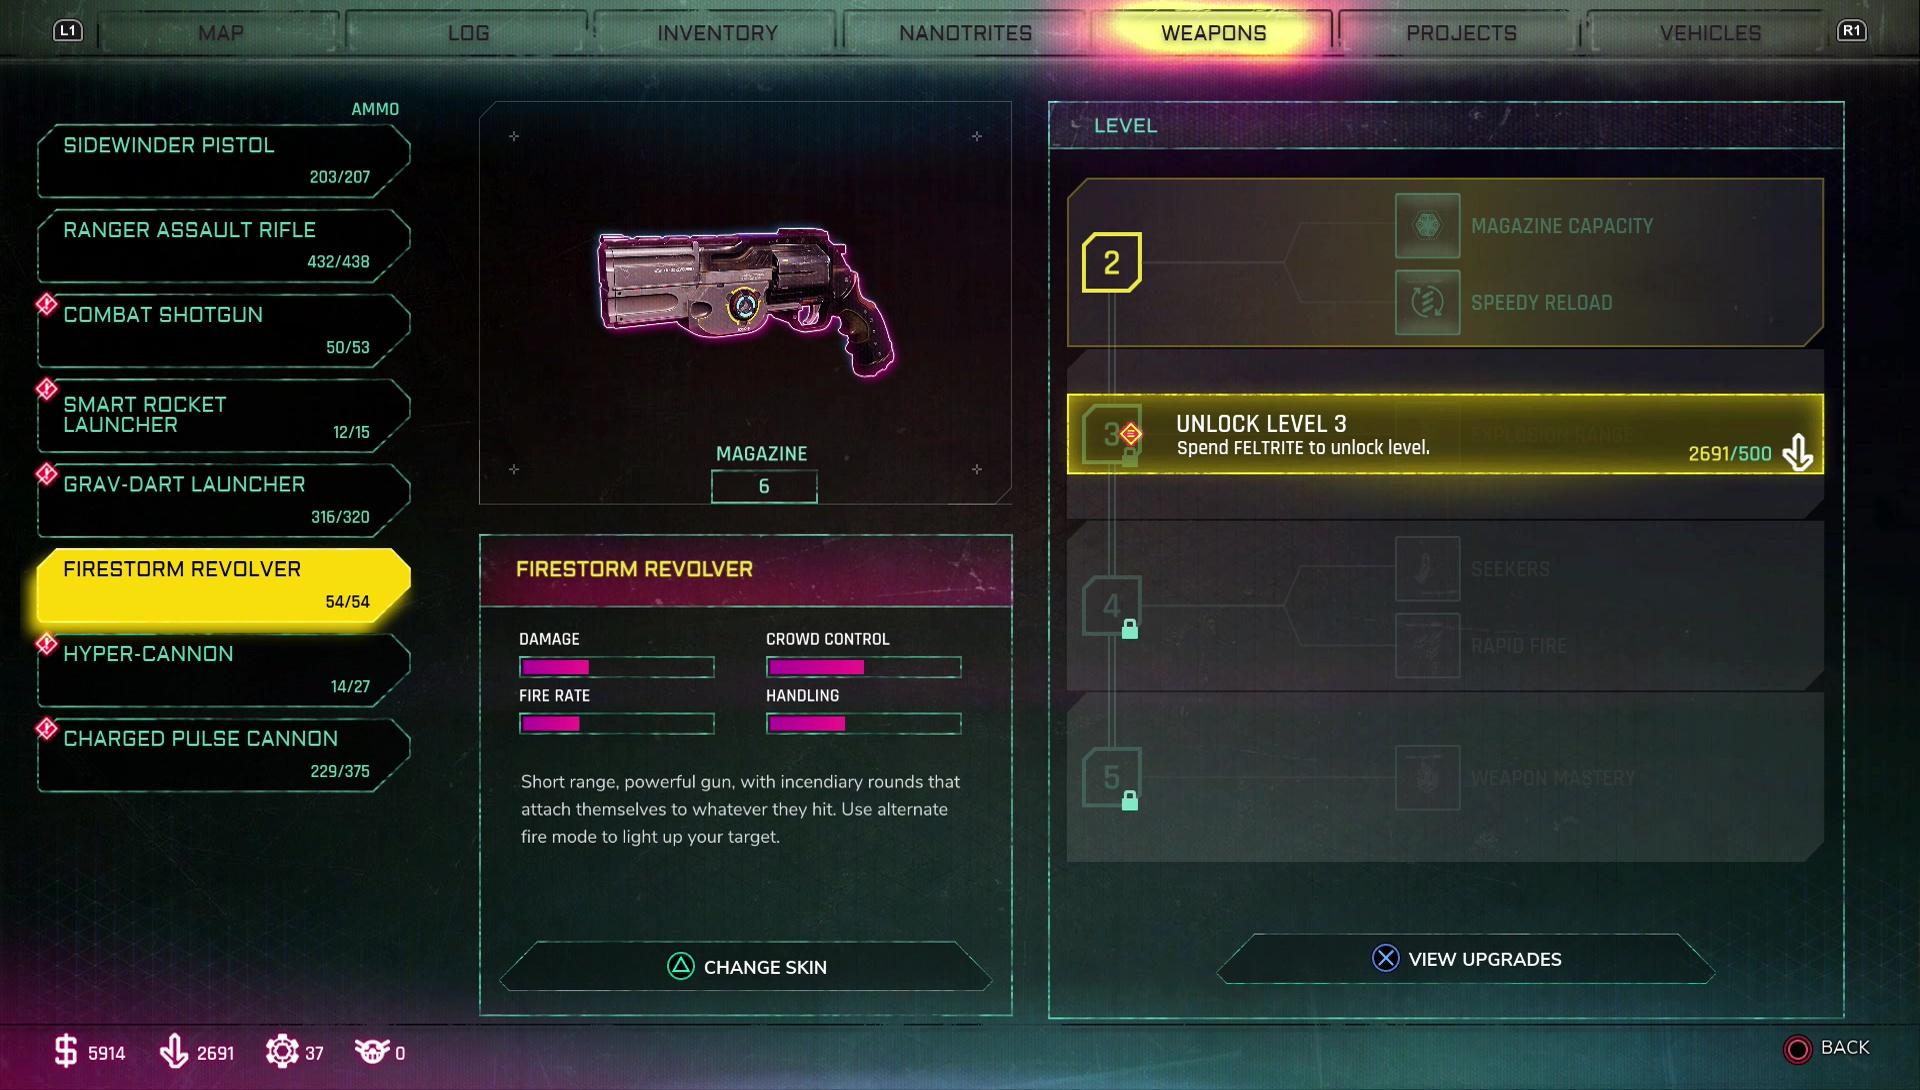 Rage 2 Firestorm Revolver Location - How to Get | 1920 x 1090 jpeg 527kB